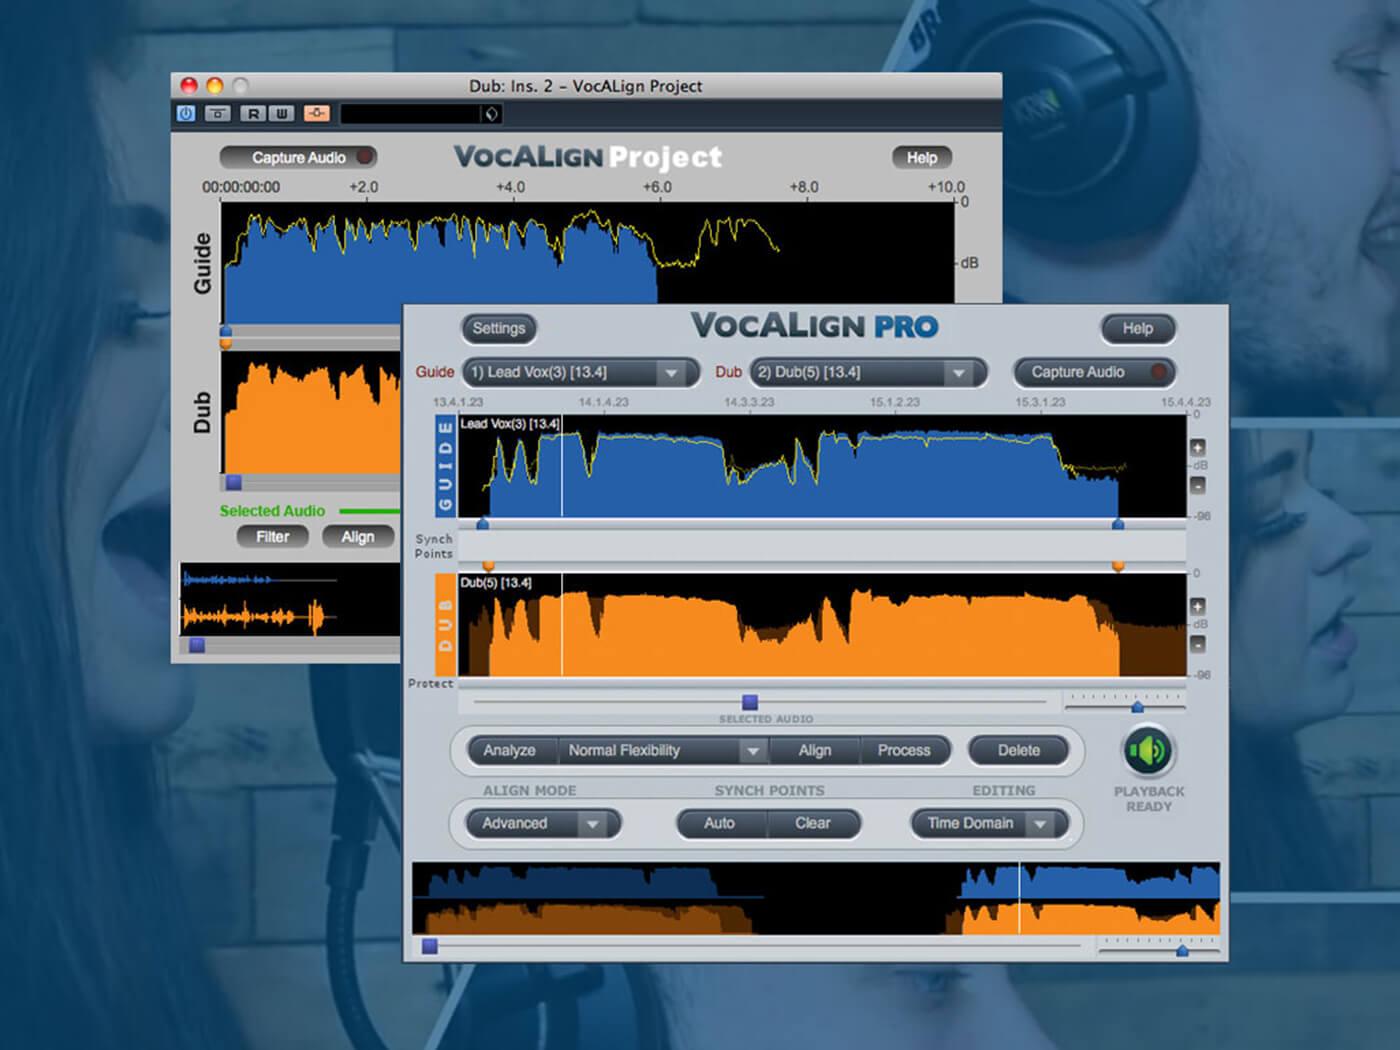 vocalign plug-ins